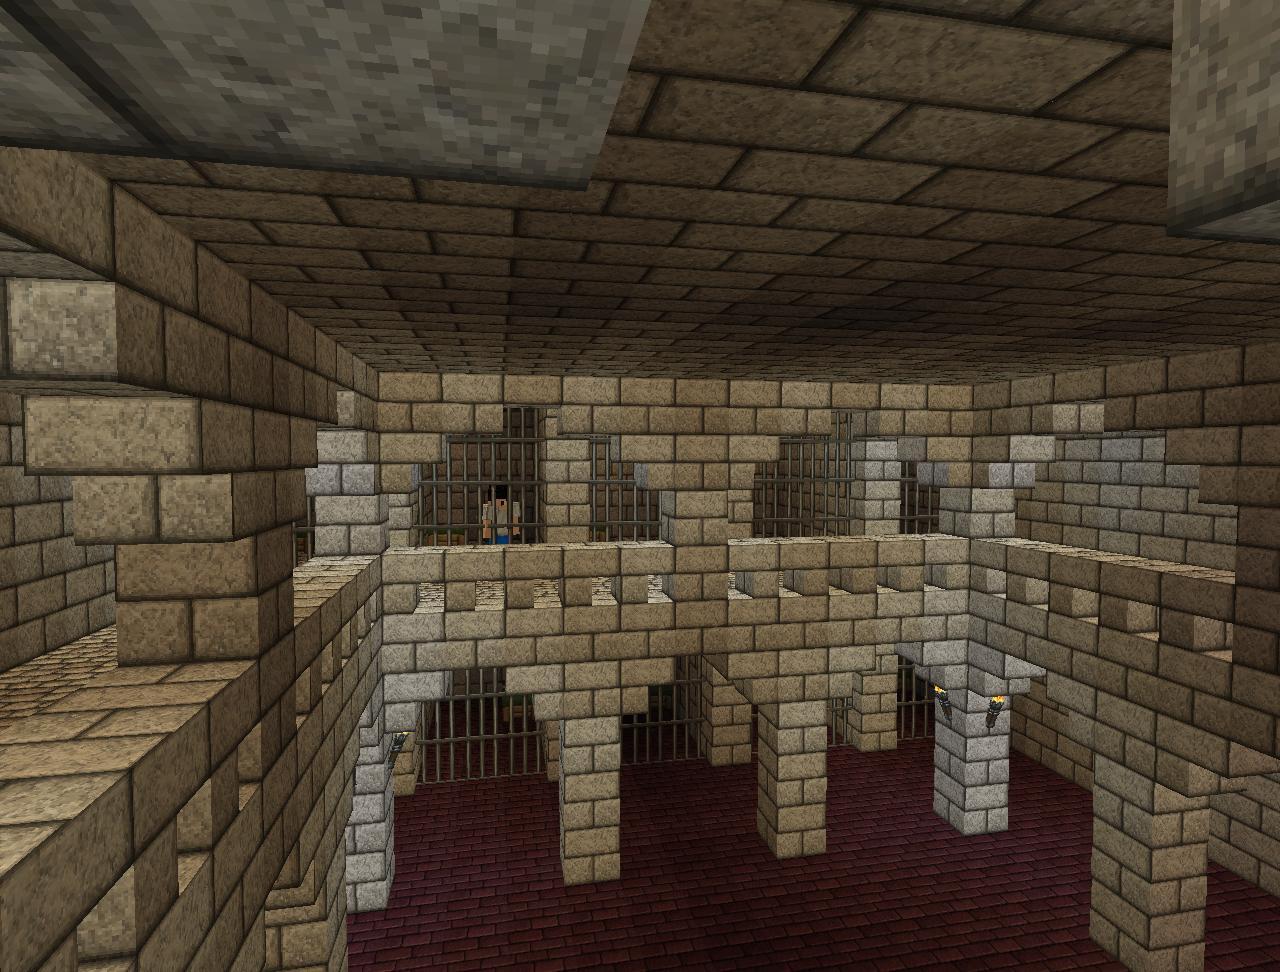 MinionLand jail